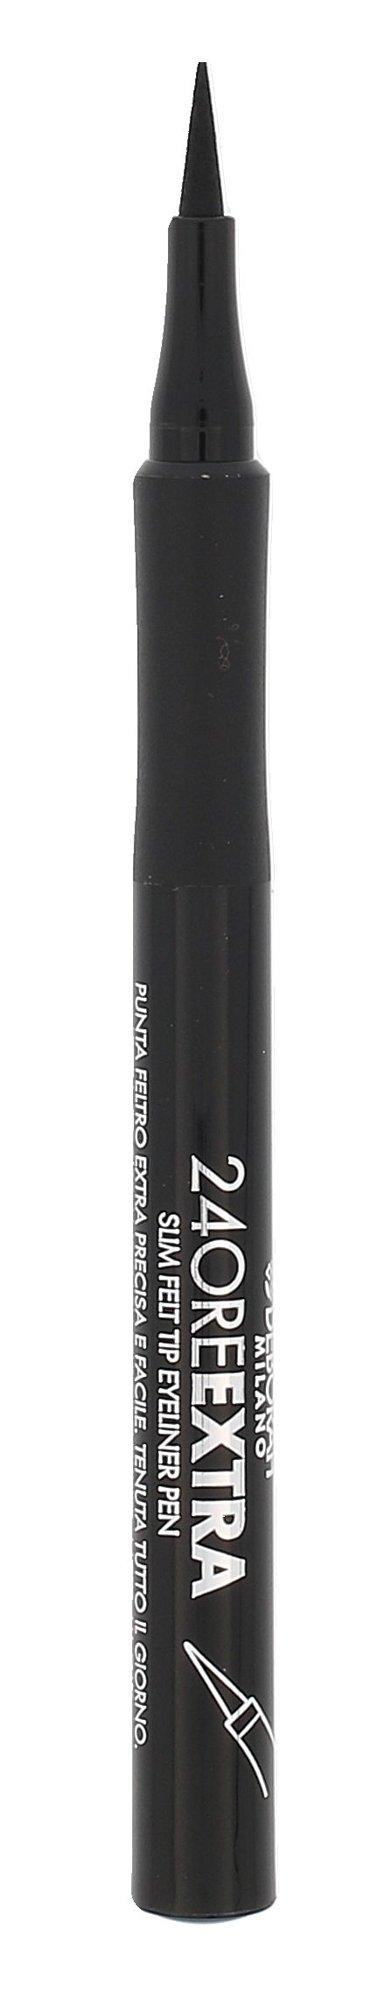 Deborah Milano 24Ore Cosmetic 2ml Black